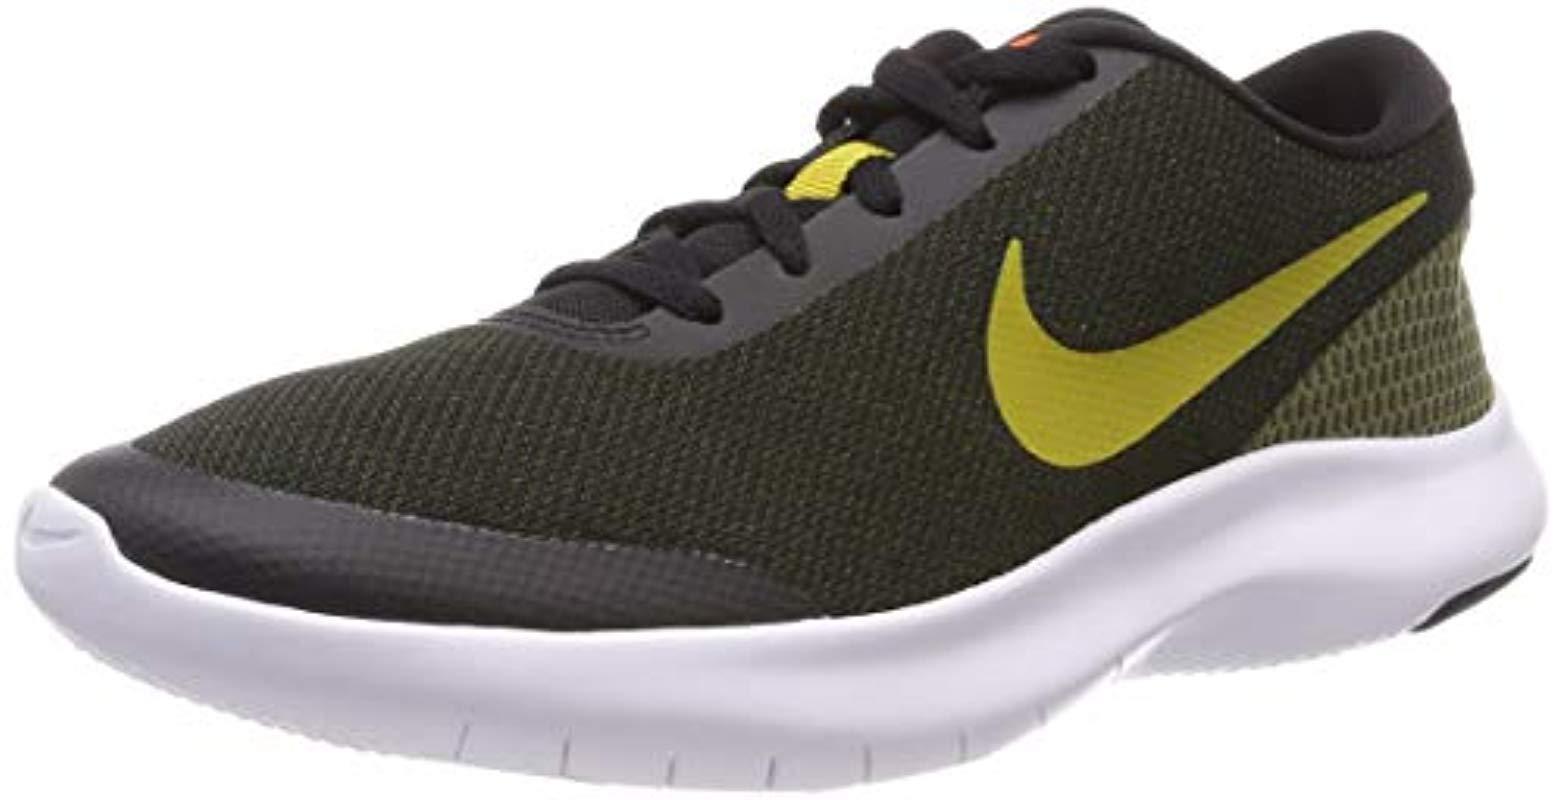 77ed5a5dfdf97 Lyst - Nike Flex Experience Rn 7 Running Shoe in Black for Men